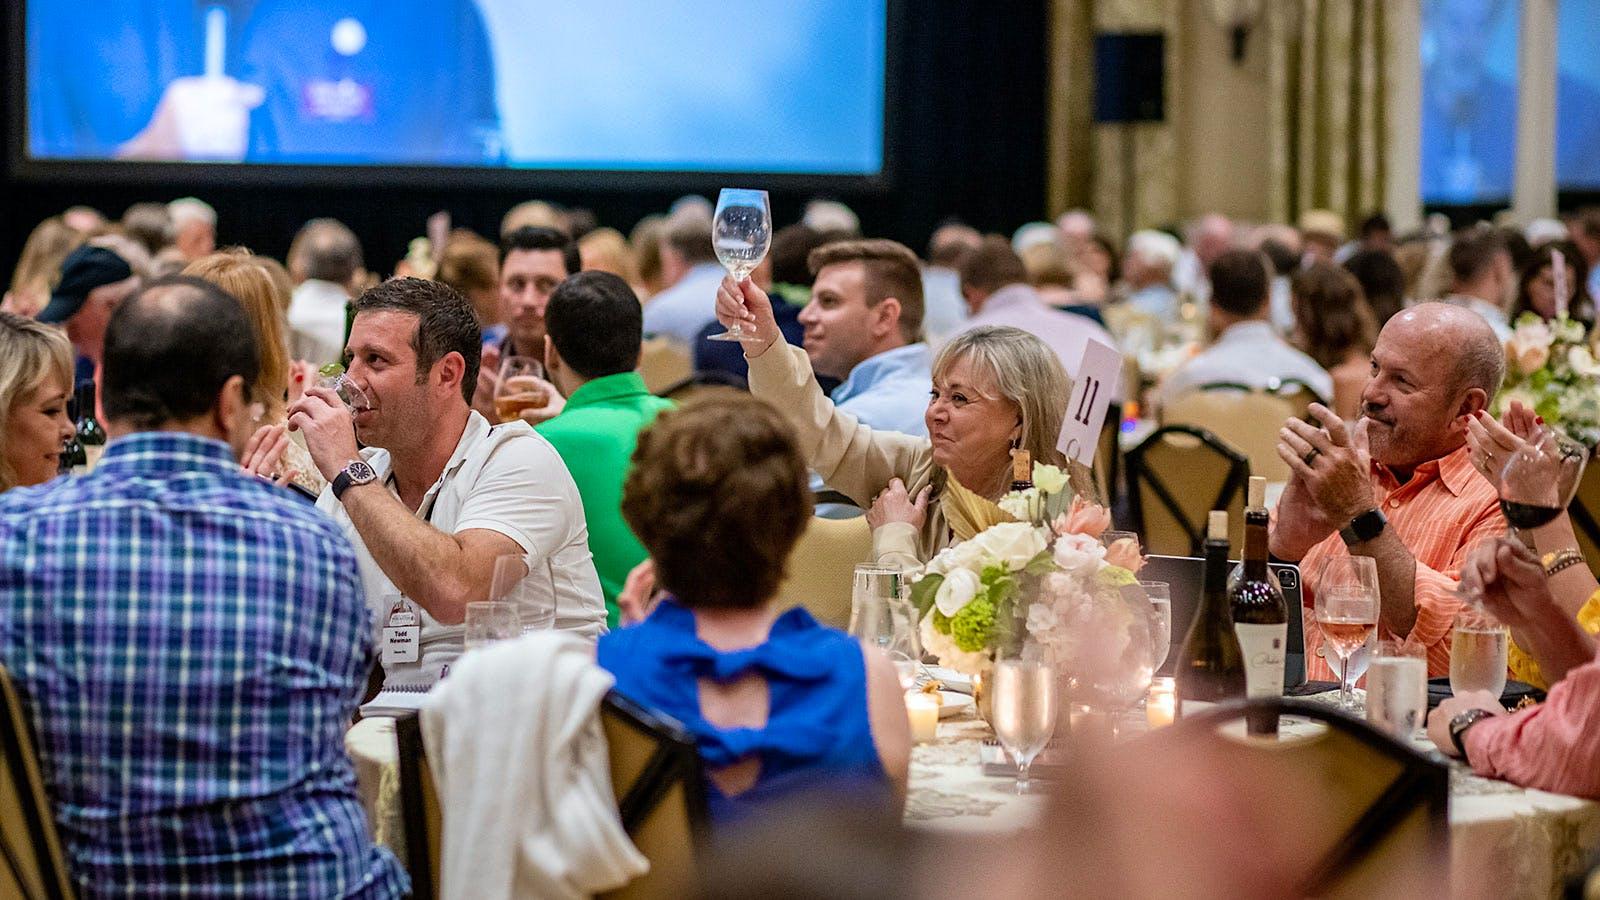 Destin Charity Wine Auction Raises $2 Million in Hybrid Live-Virtual Event